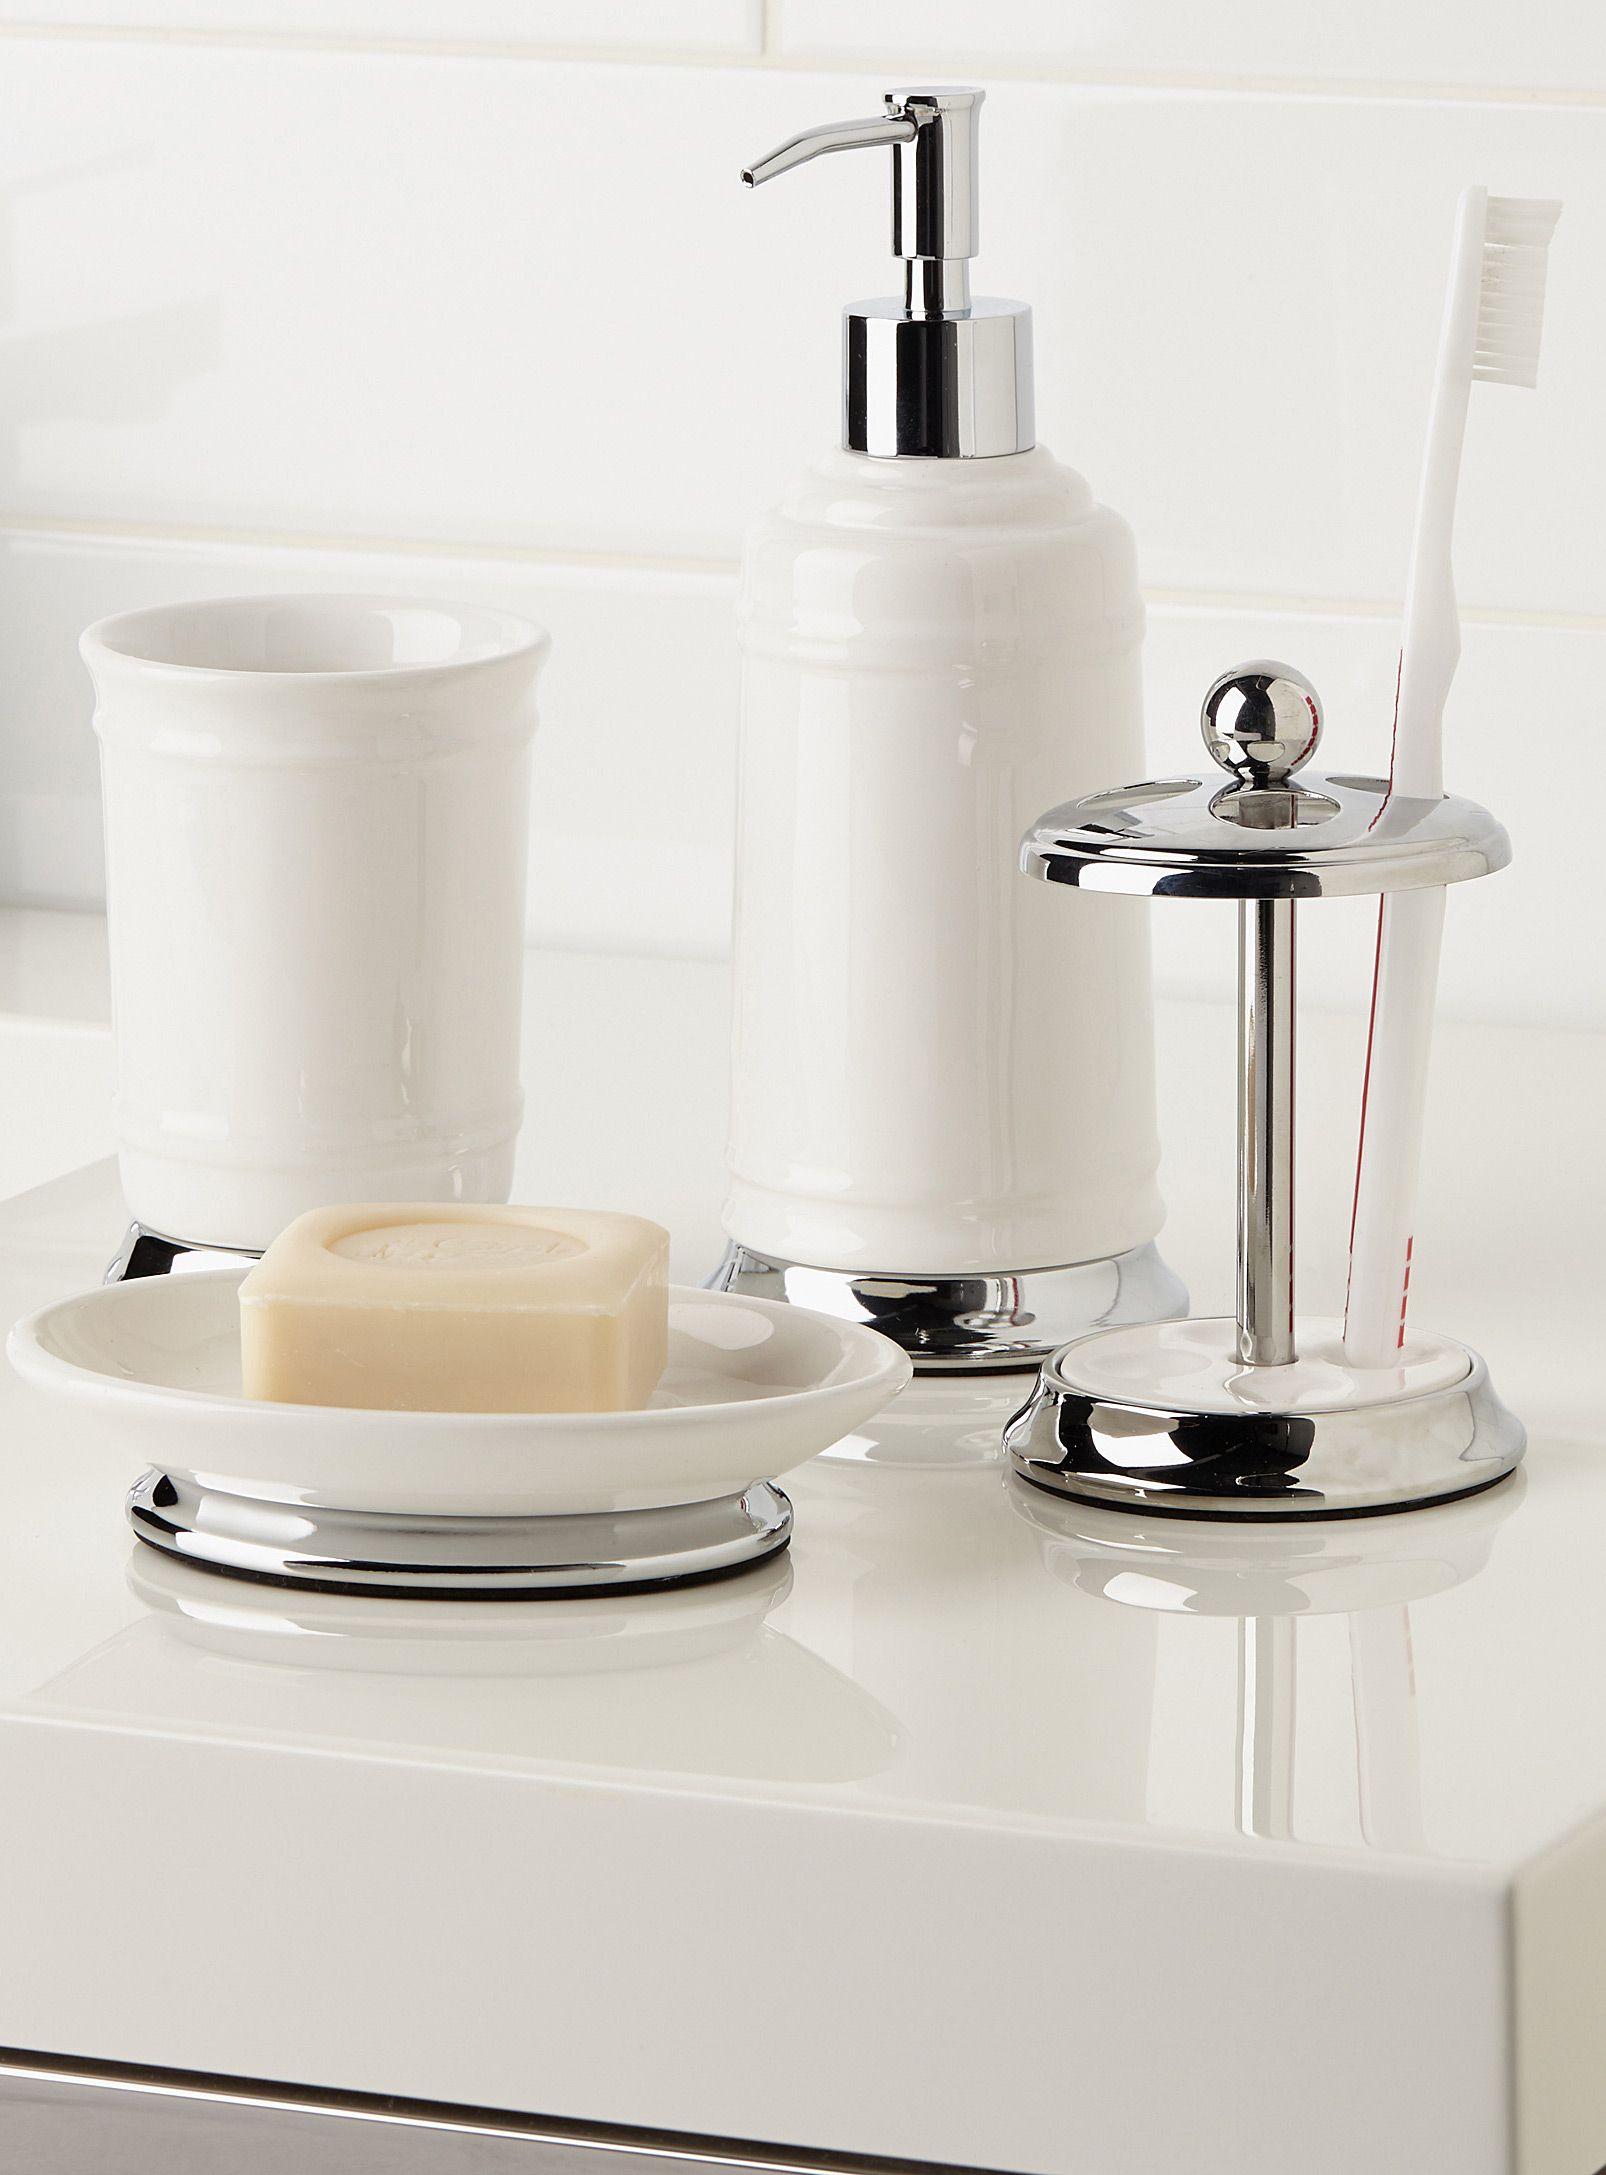 Shop Bathroom Accessories Accessory Sets Toothbrush Holder 7 Ceramic Accessory Dish Soap Soap Dispenser